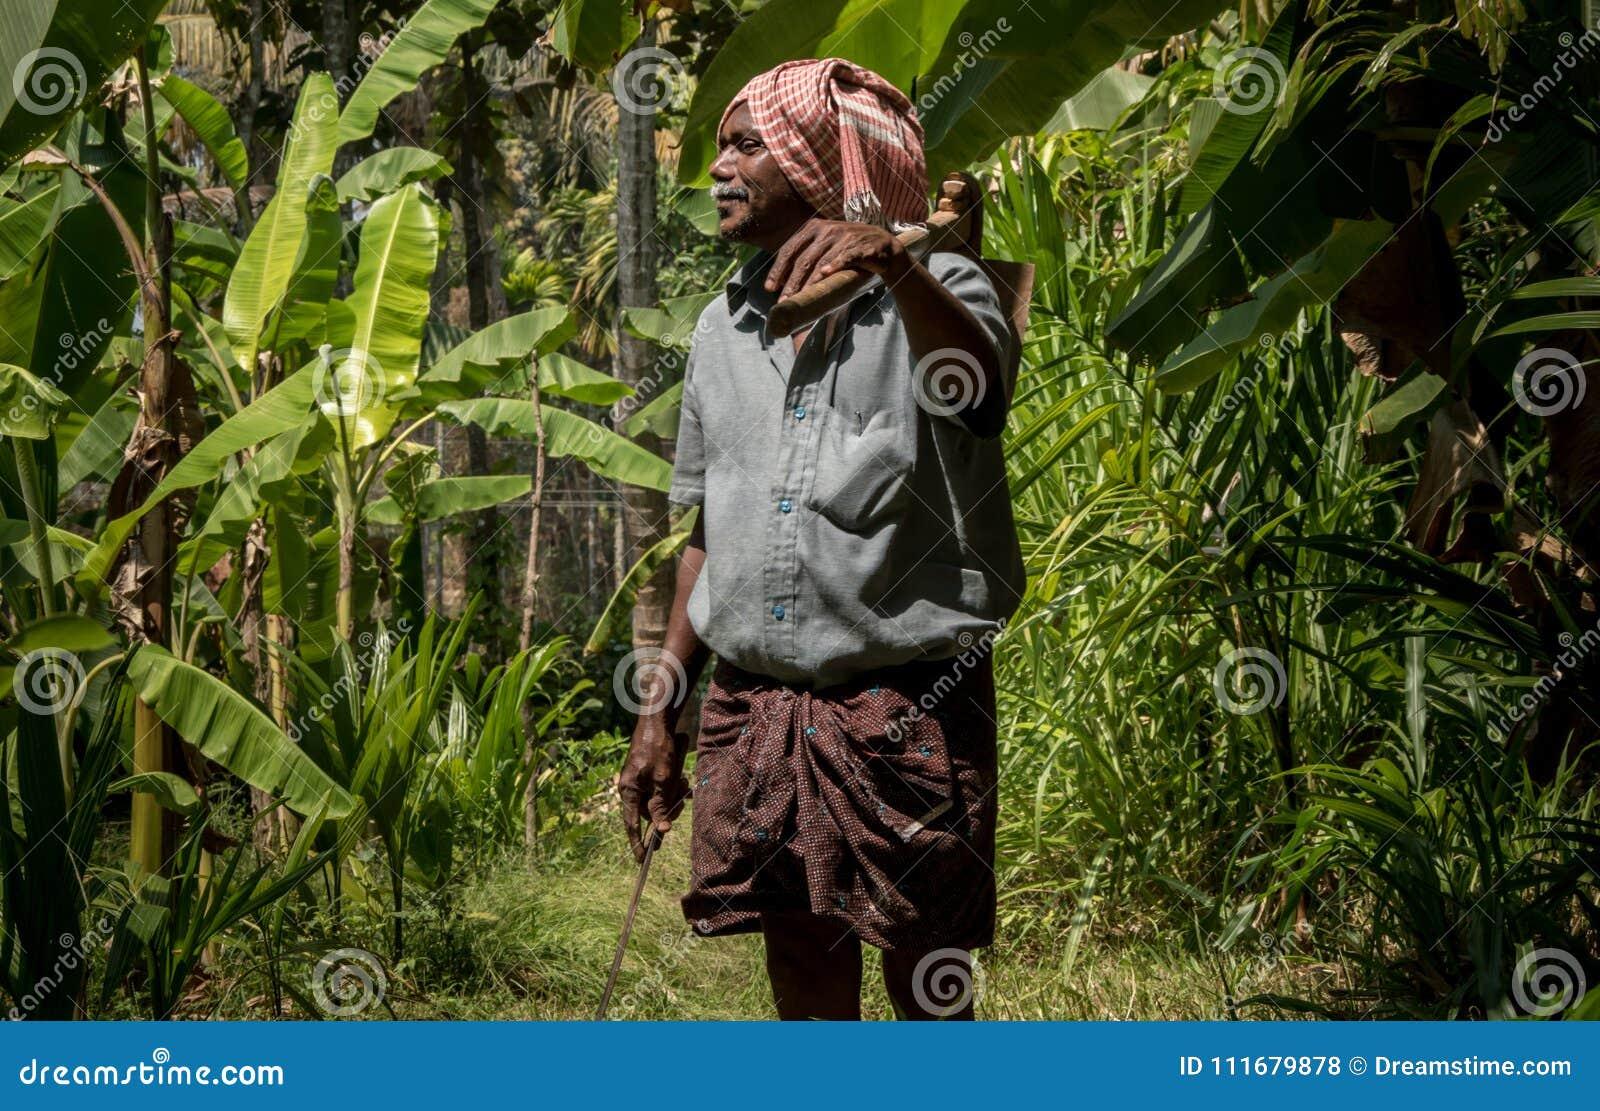 Banana tree Agriculture in kerala